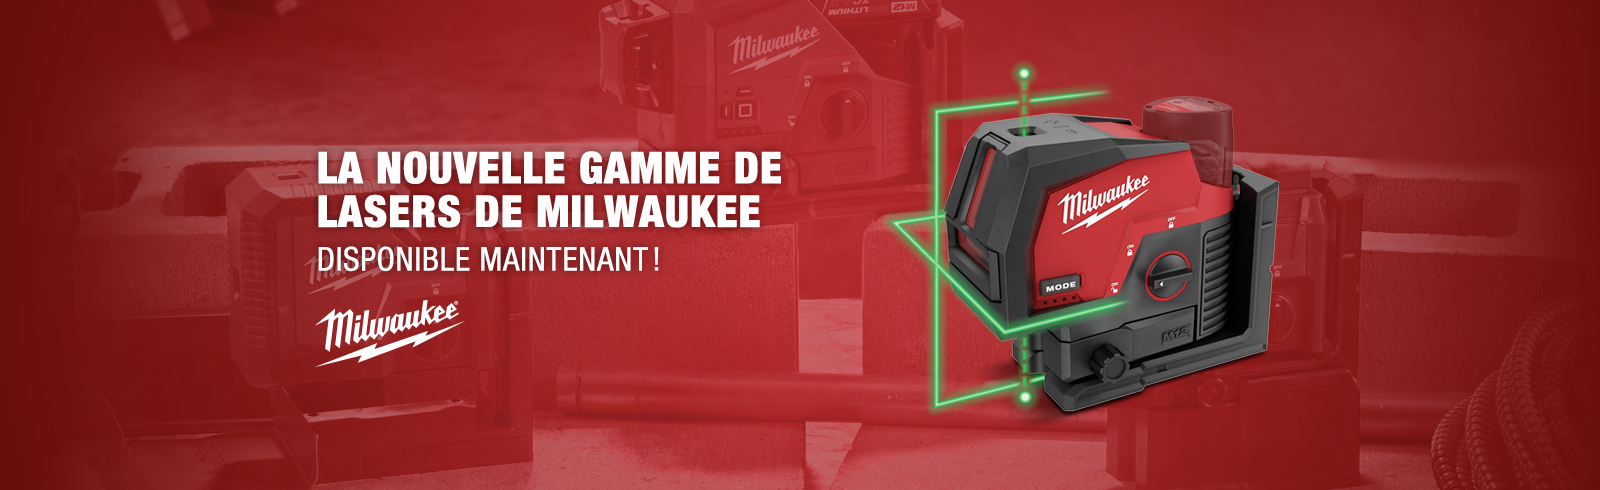 Nouvelle game de laser Milwaukee